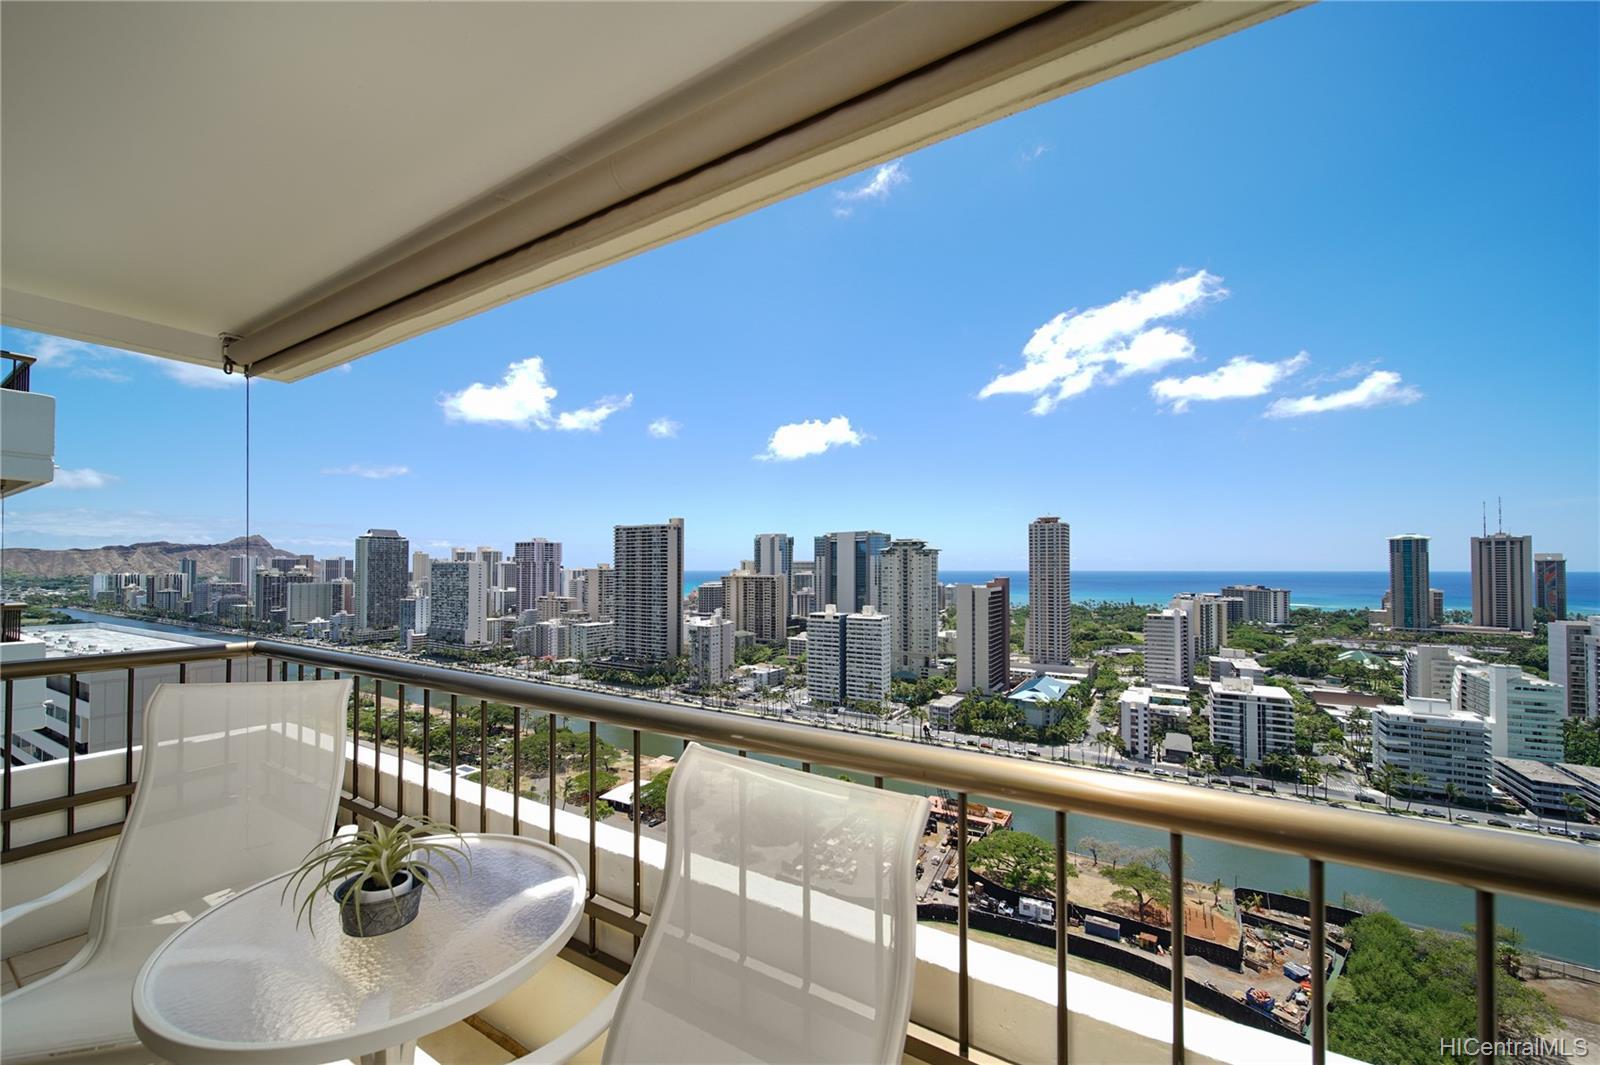 MARCO POLO APTS condo # 2909, Honolulu, Hawaii - photo 7 of 25